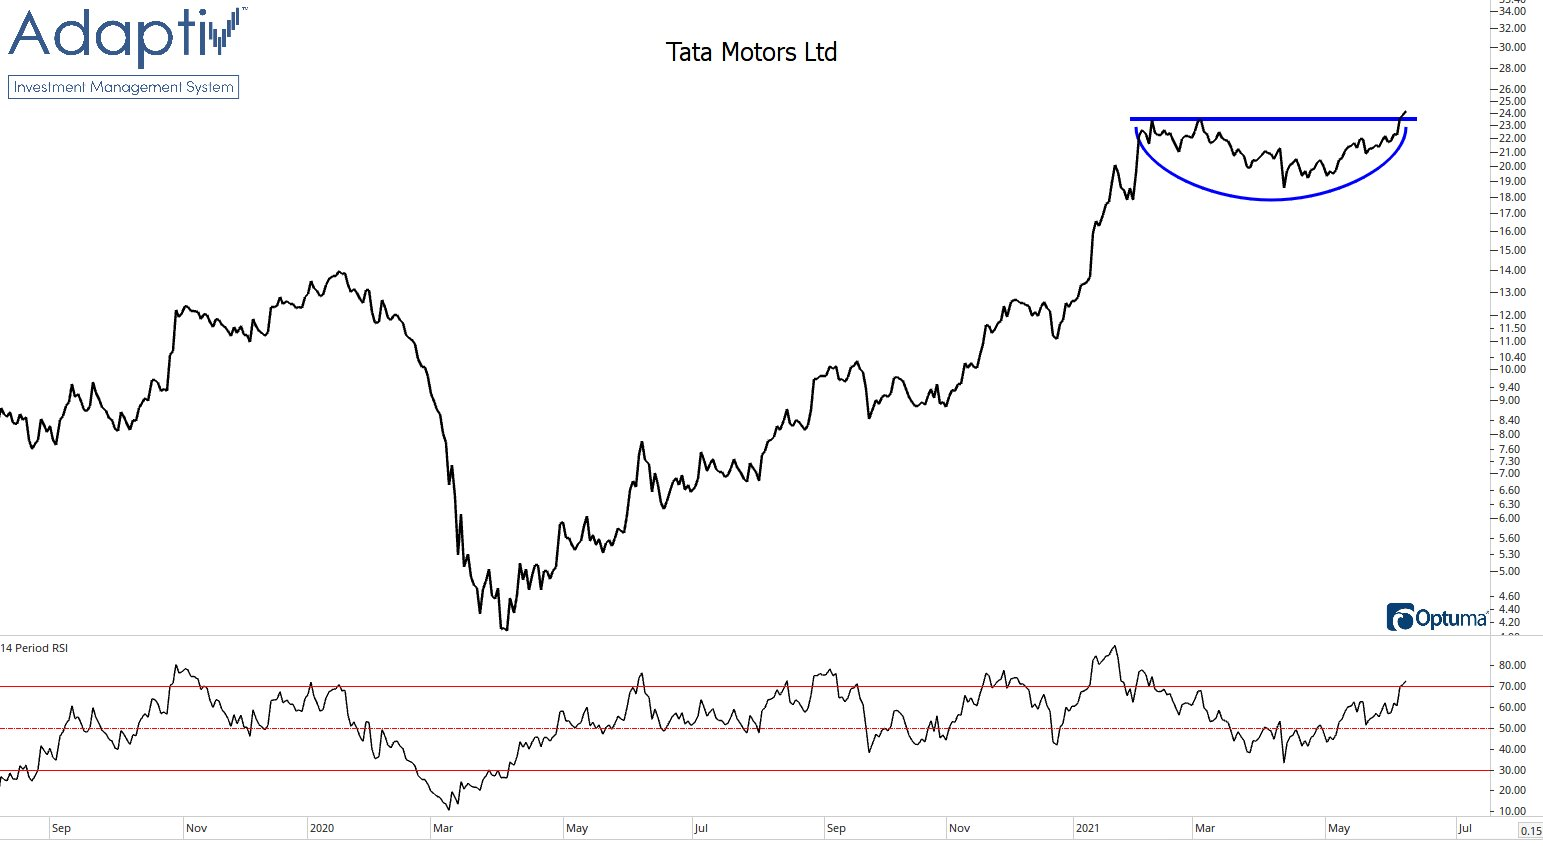 Tata Motors (owner of Jaguar Landrover) stock is breaking out